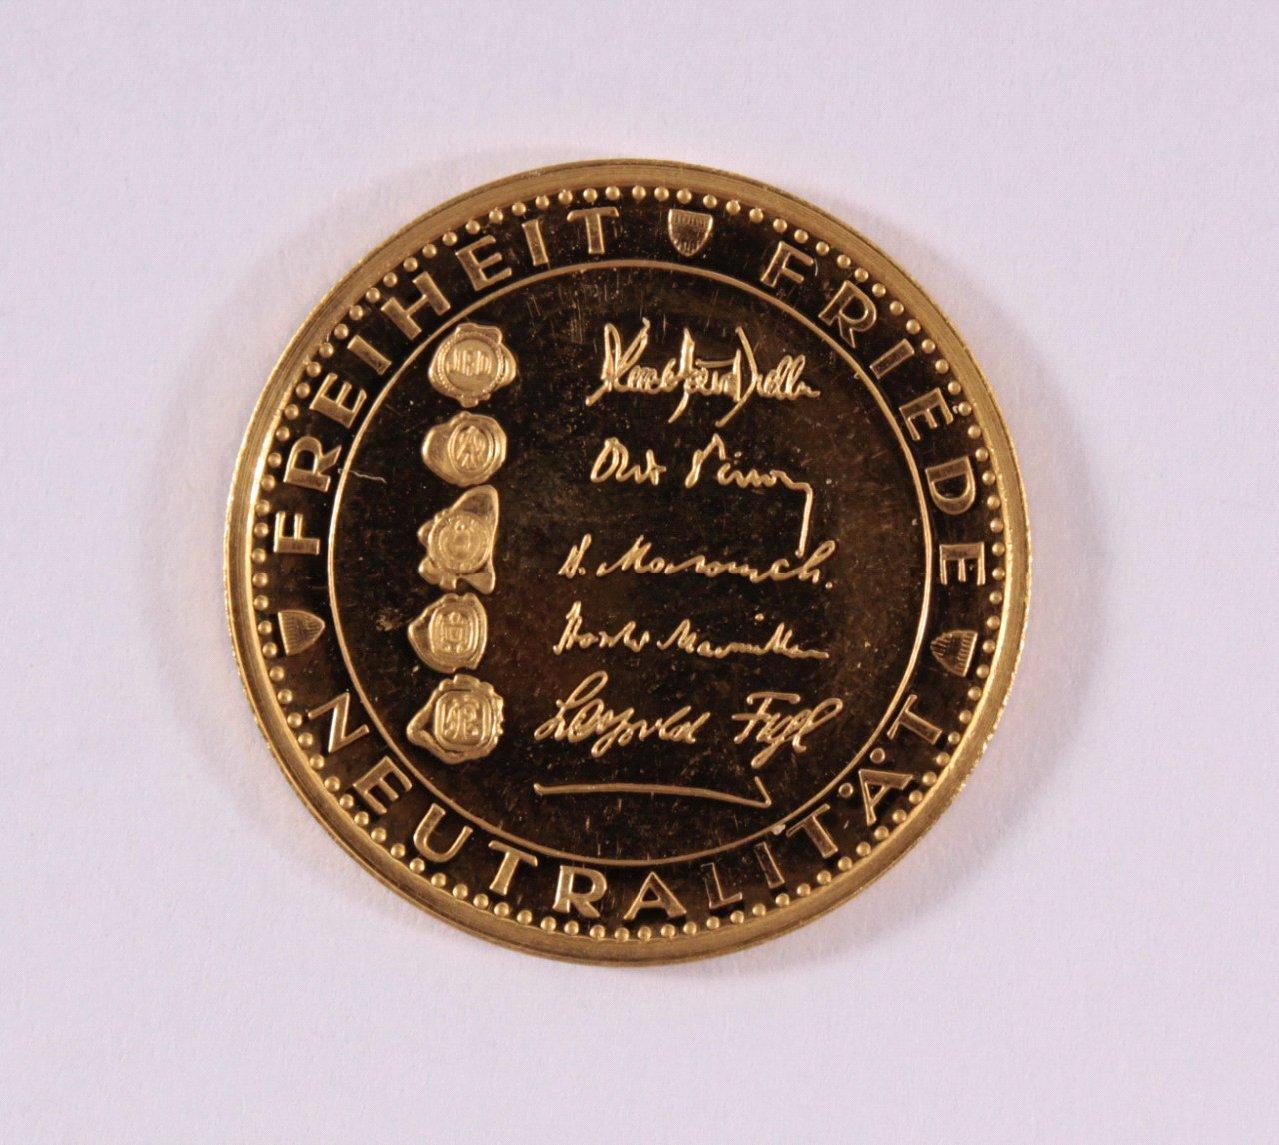 Goldmedaille 986/000 GG. 10 Jahre Österr. Staatsvertrag-1